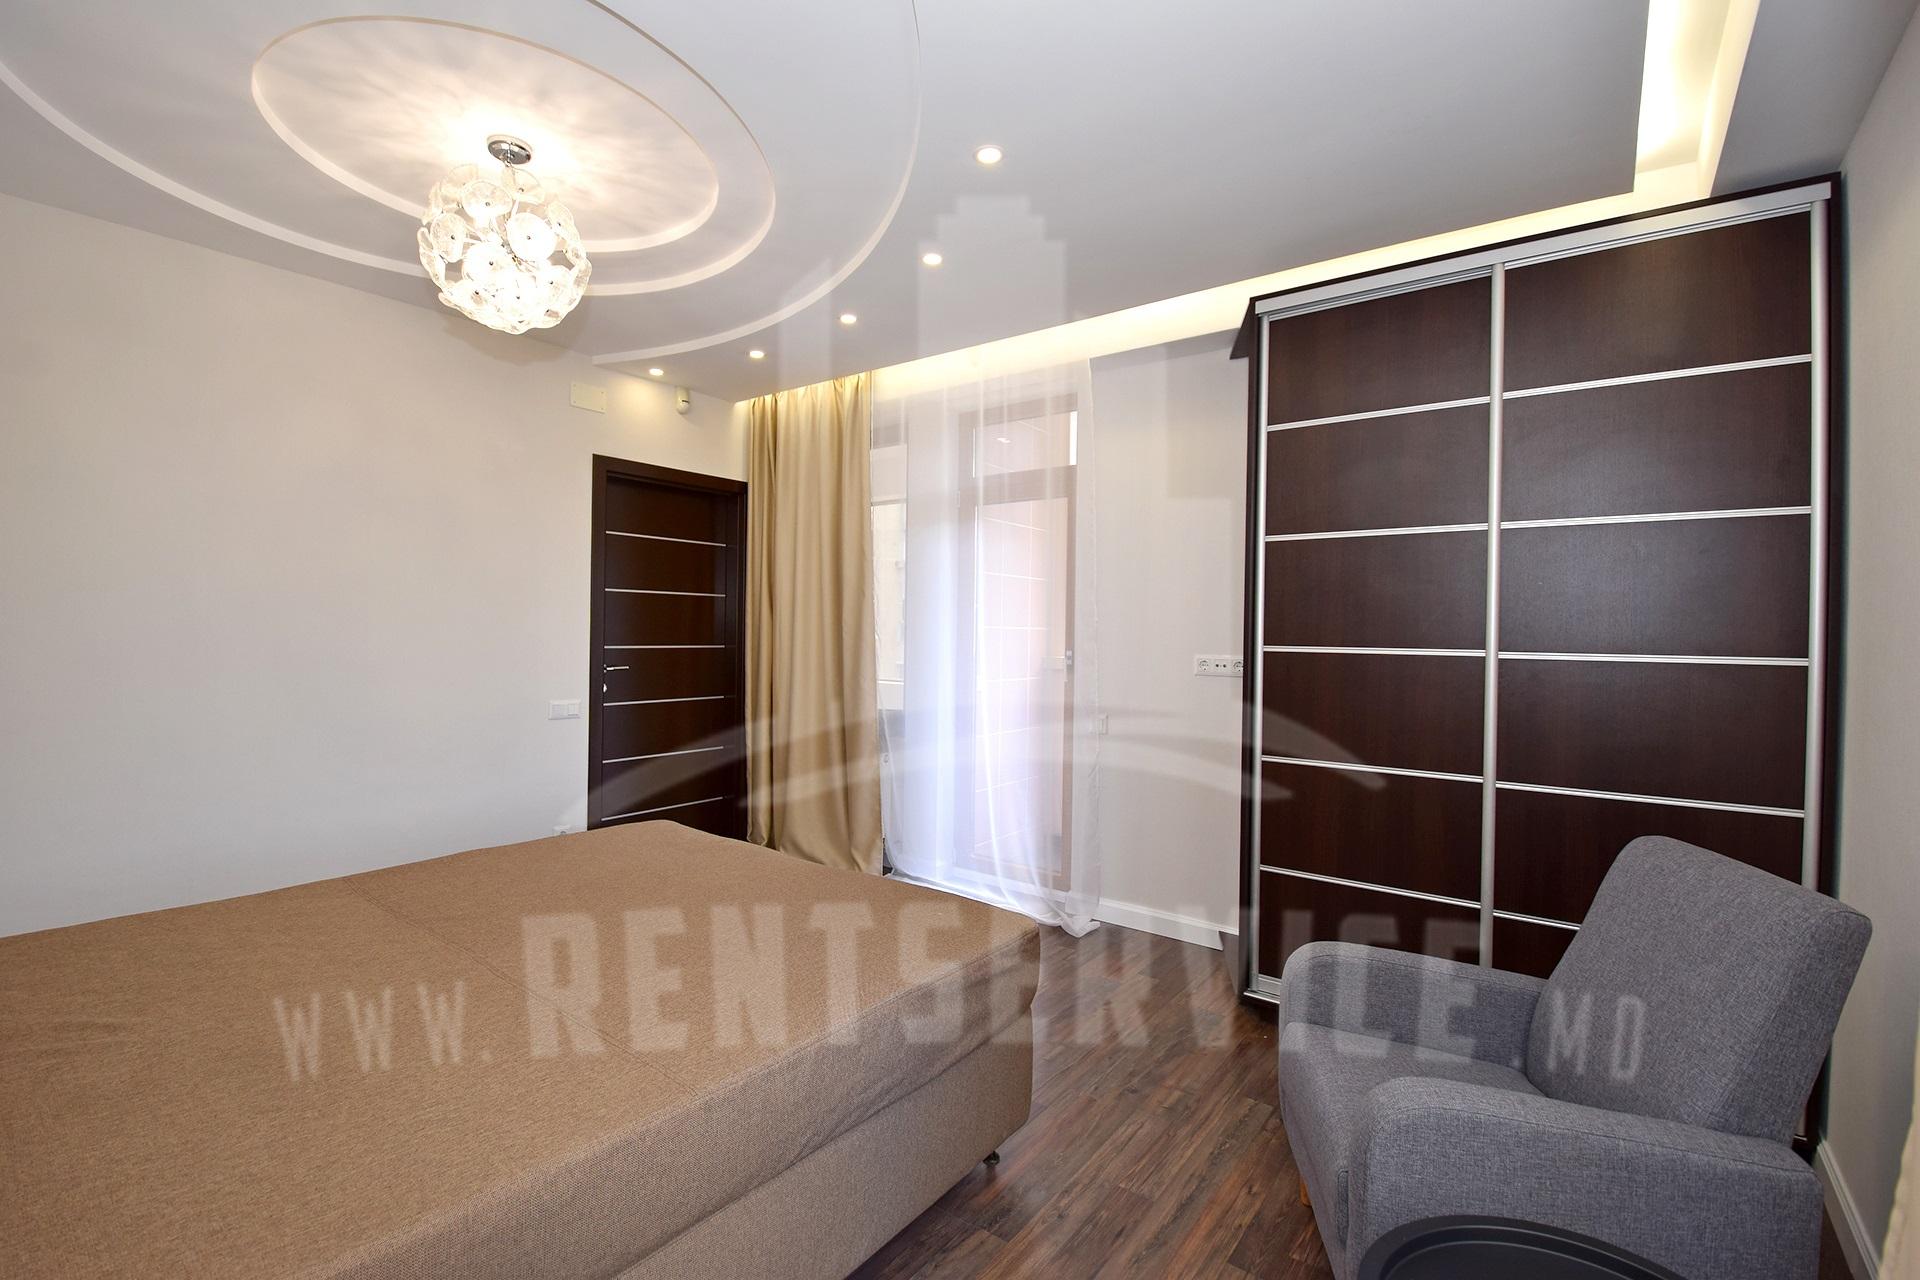 291_apartment_10.JPG